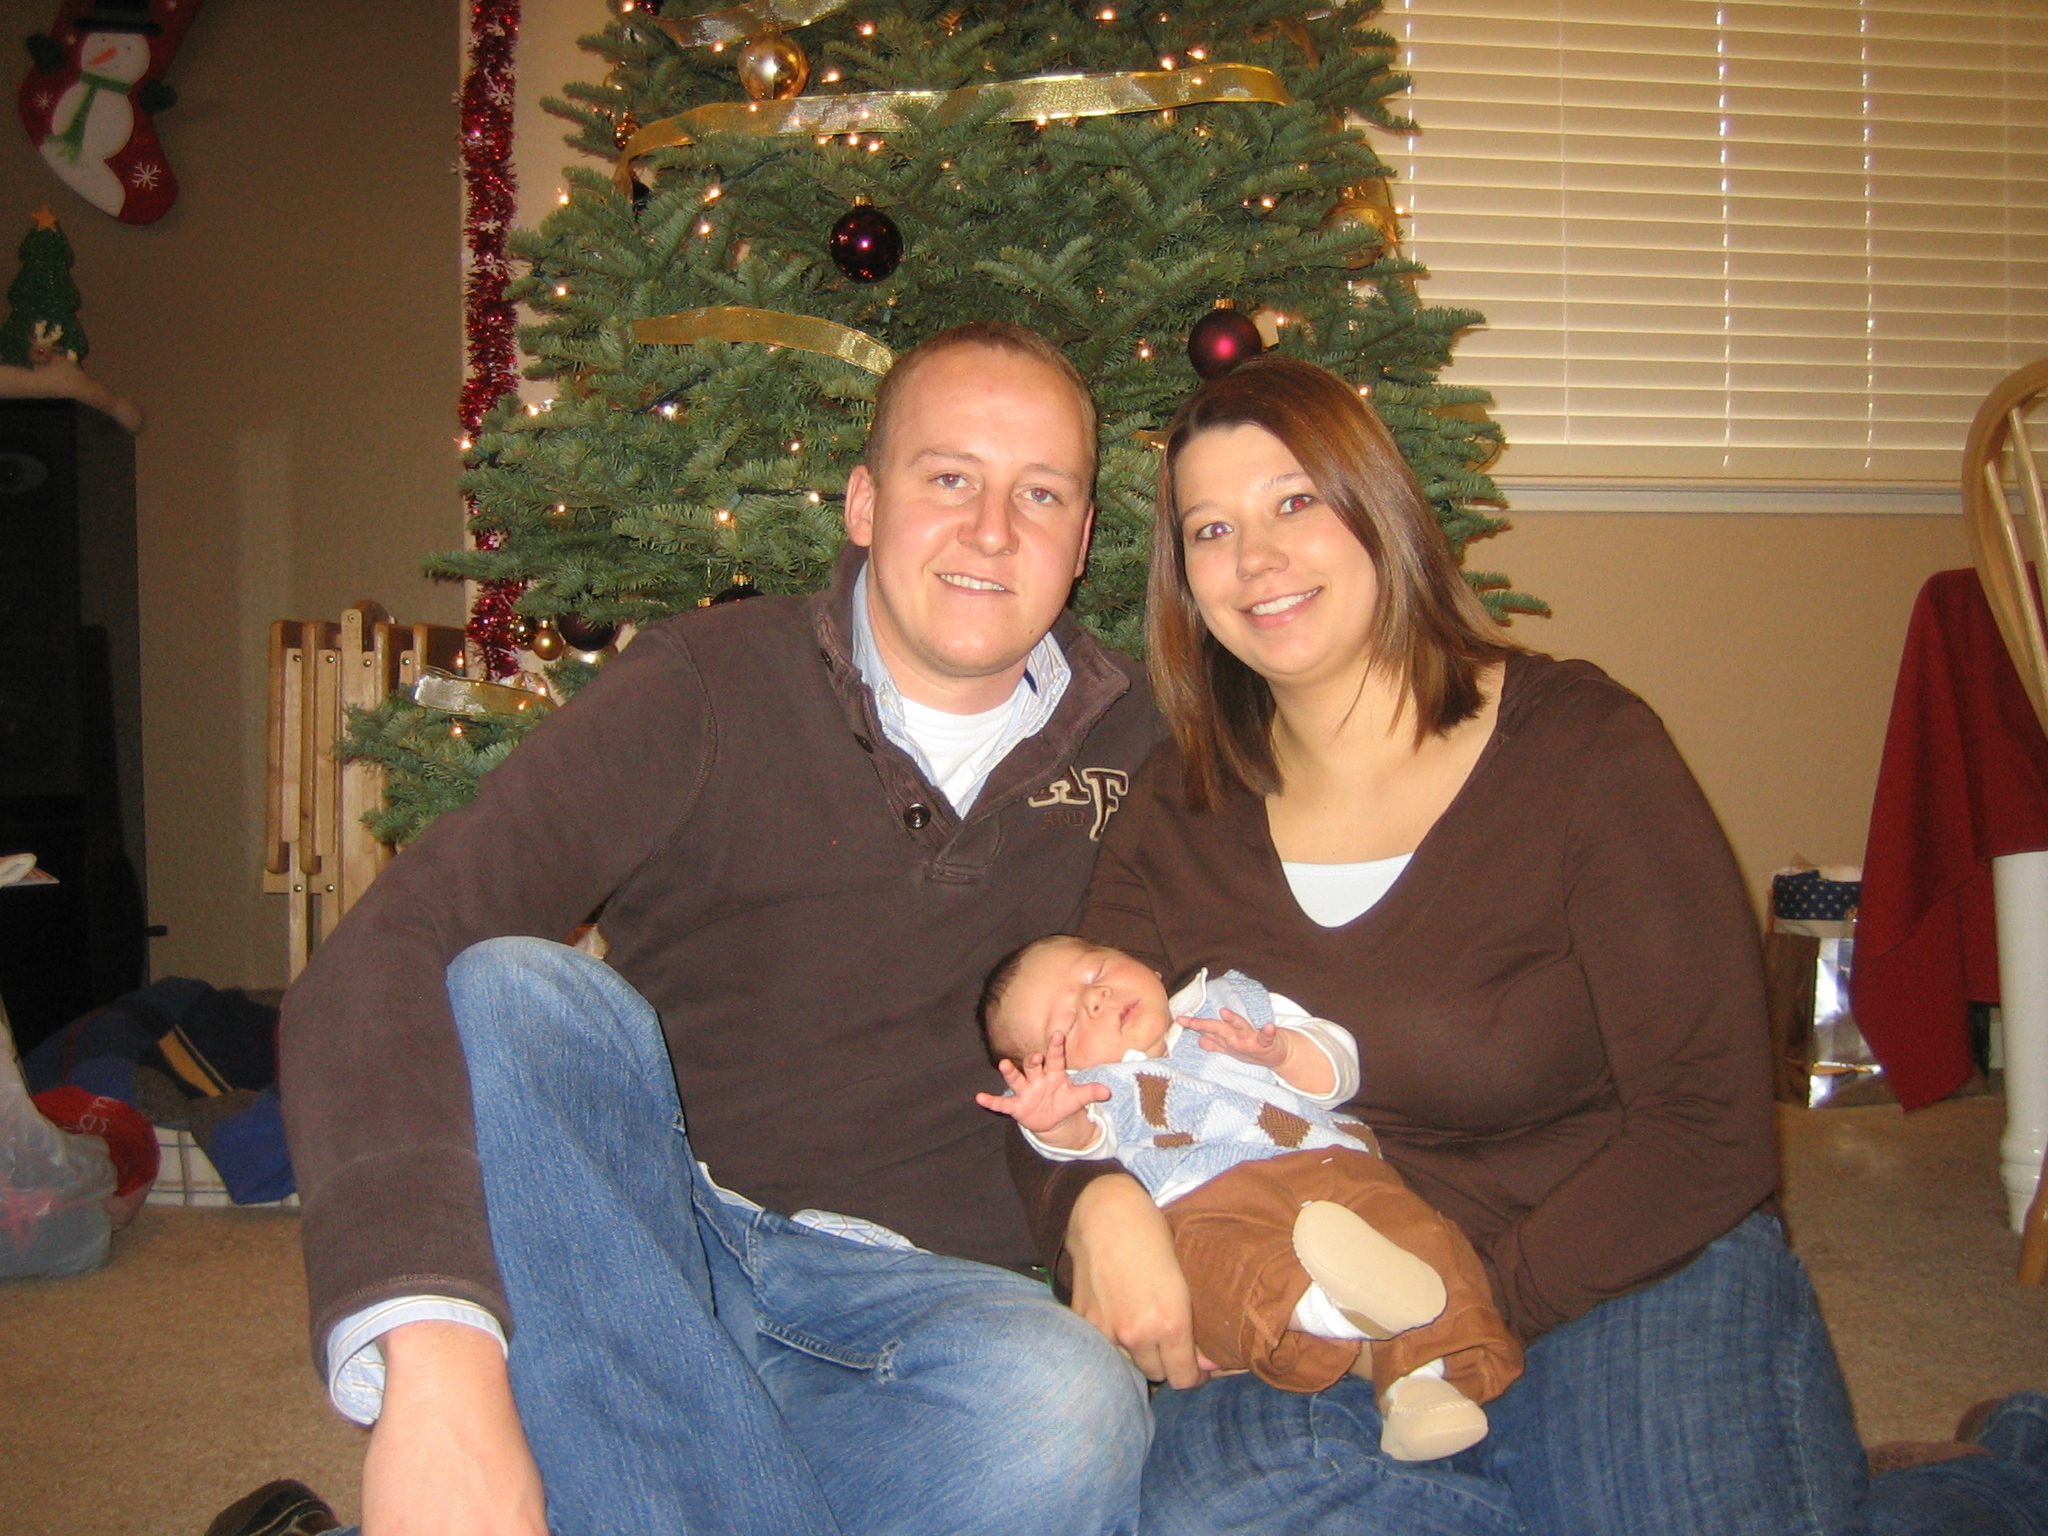 december-22-25-2007-009.jpg